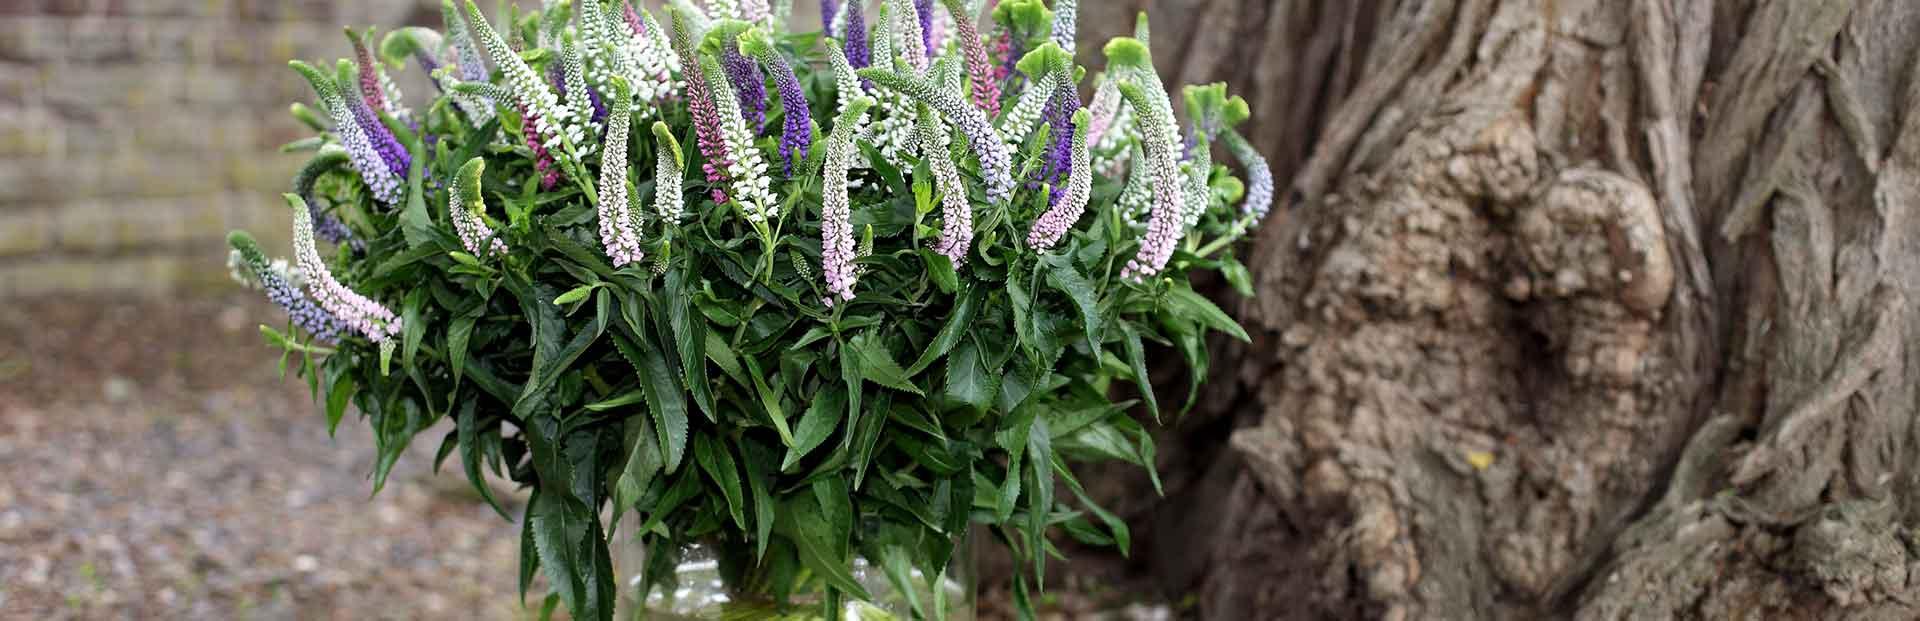 Veronica Smart Series Abyssinia Flowers